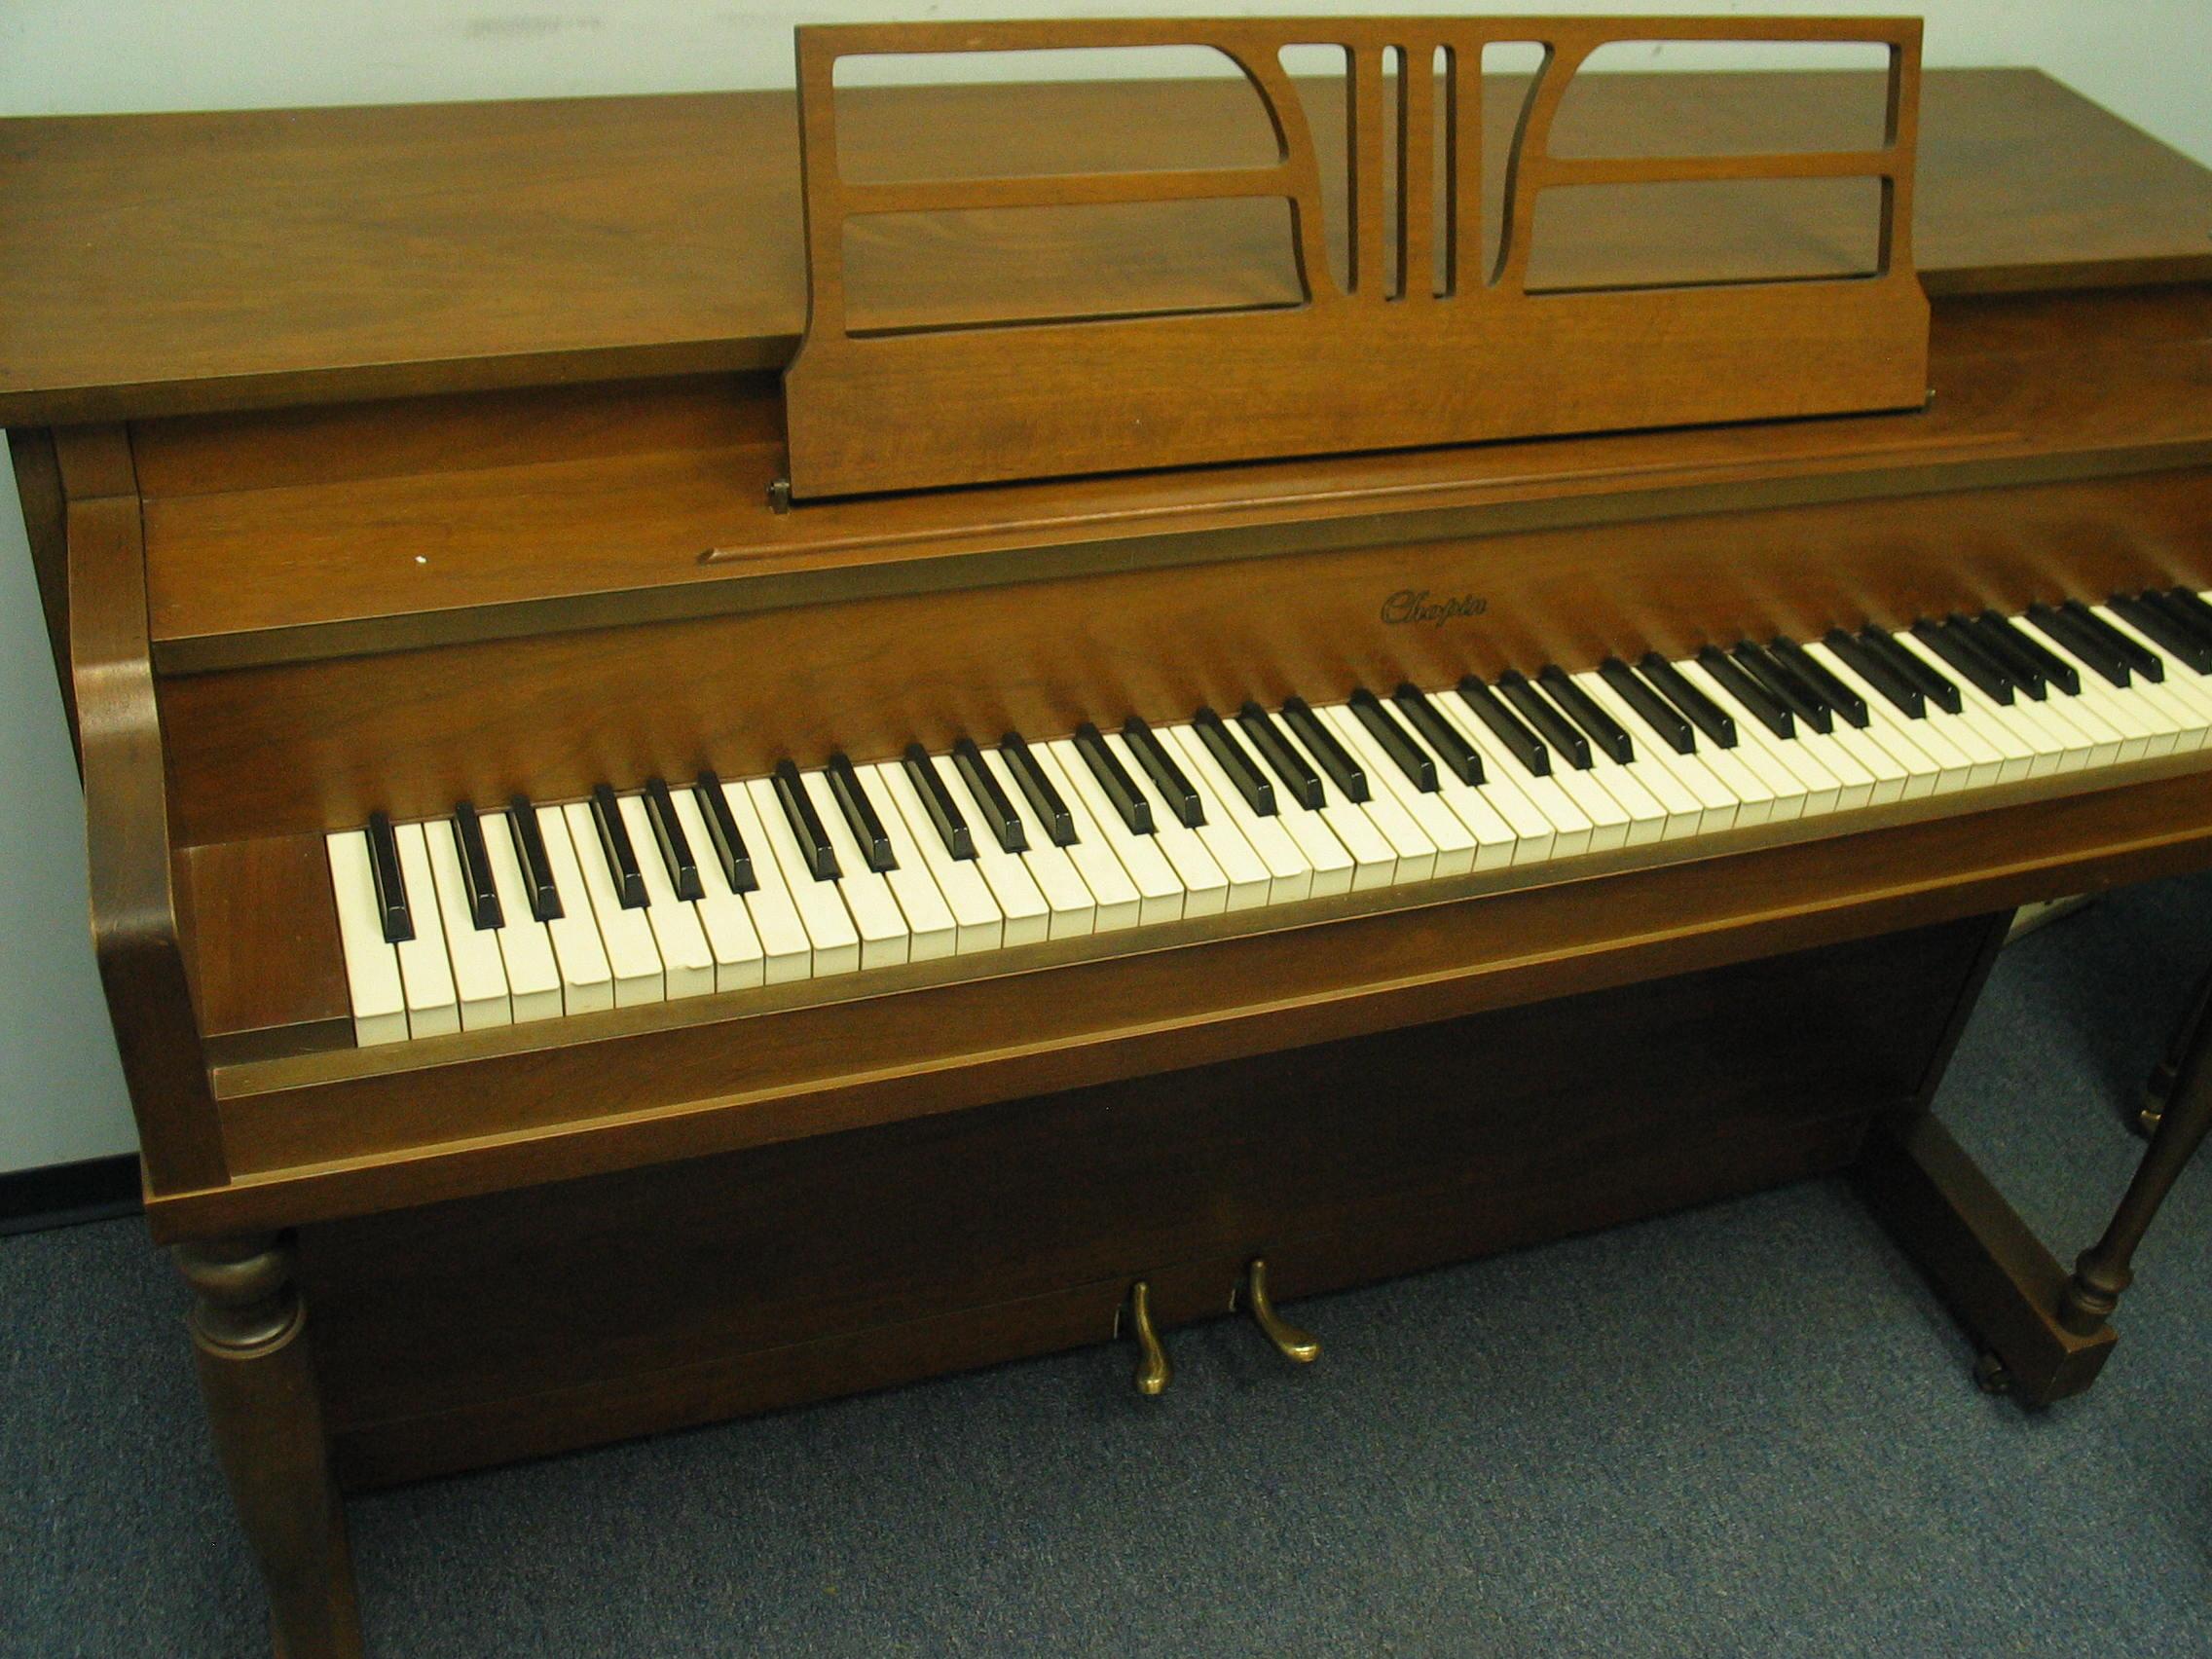 Mason and risch piano key generator